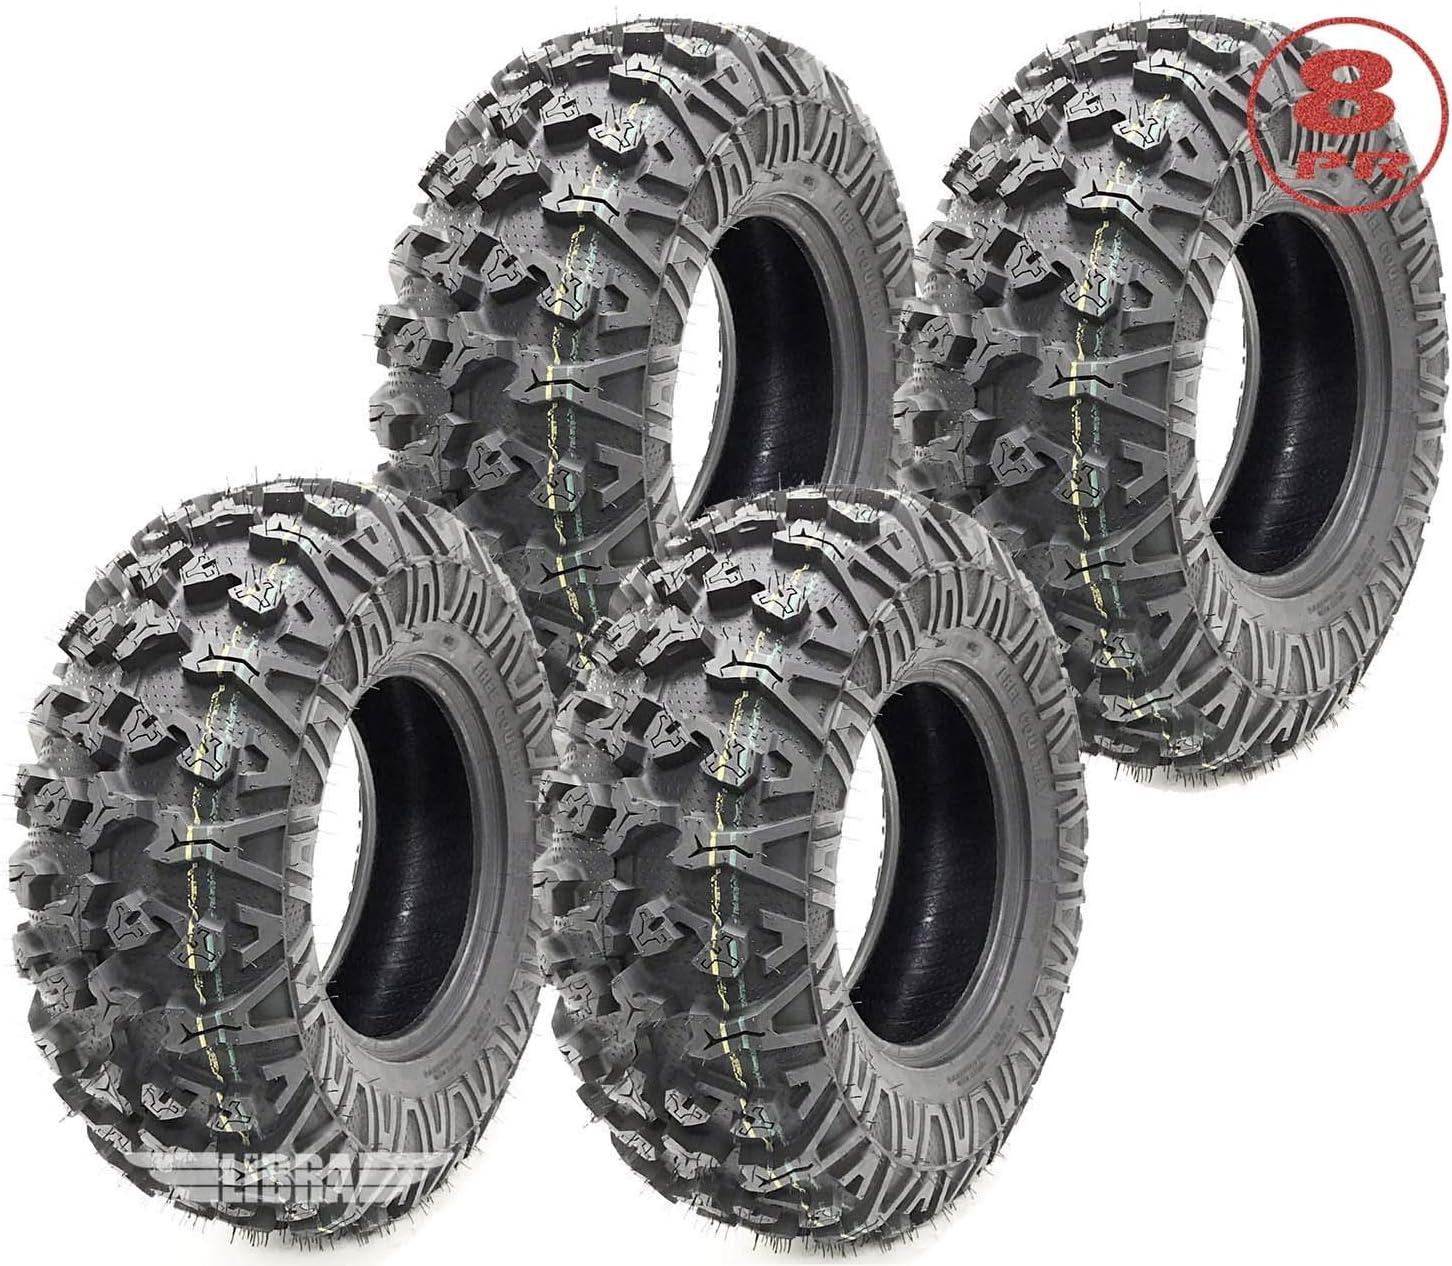 Set of 4 Premium Free Country ATV/UTV Tires